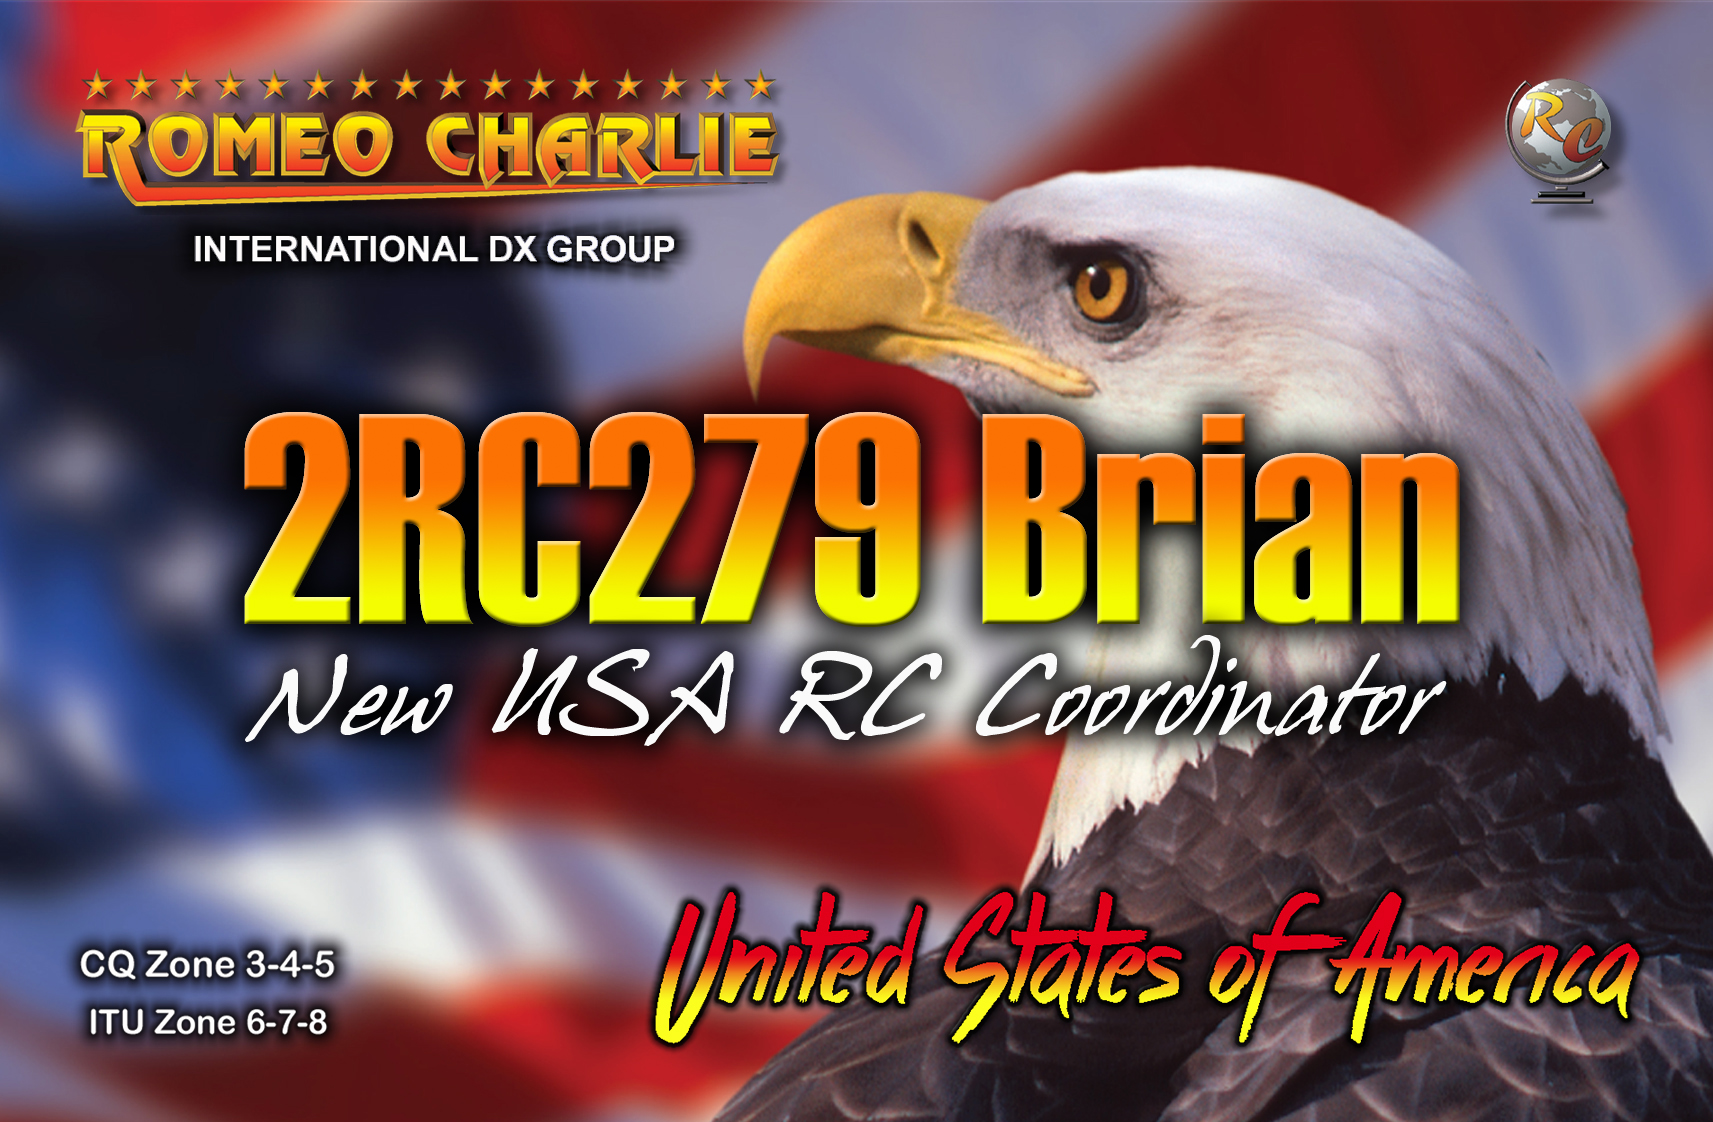 2rc279-coordinator